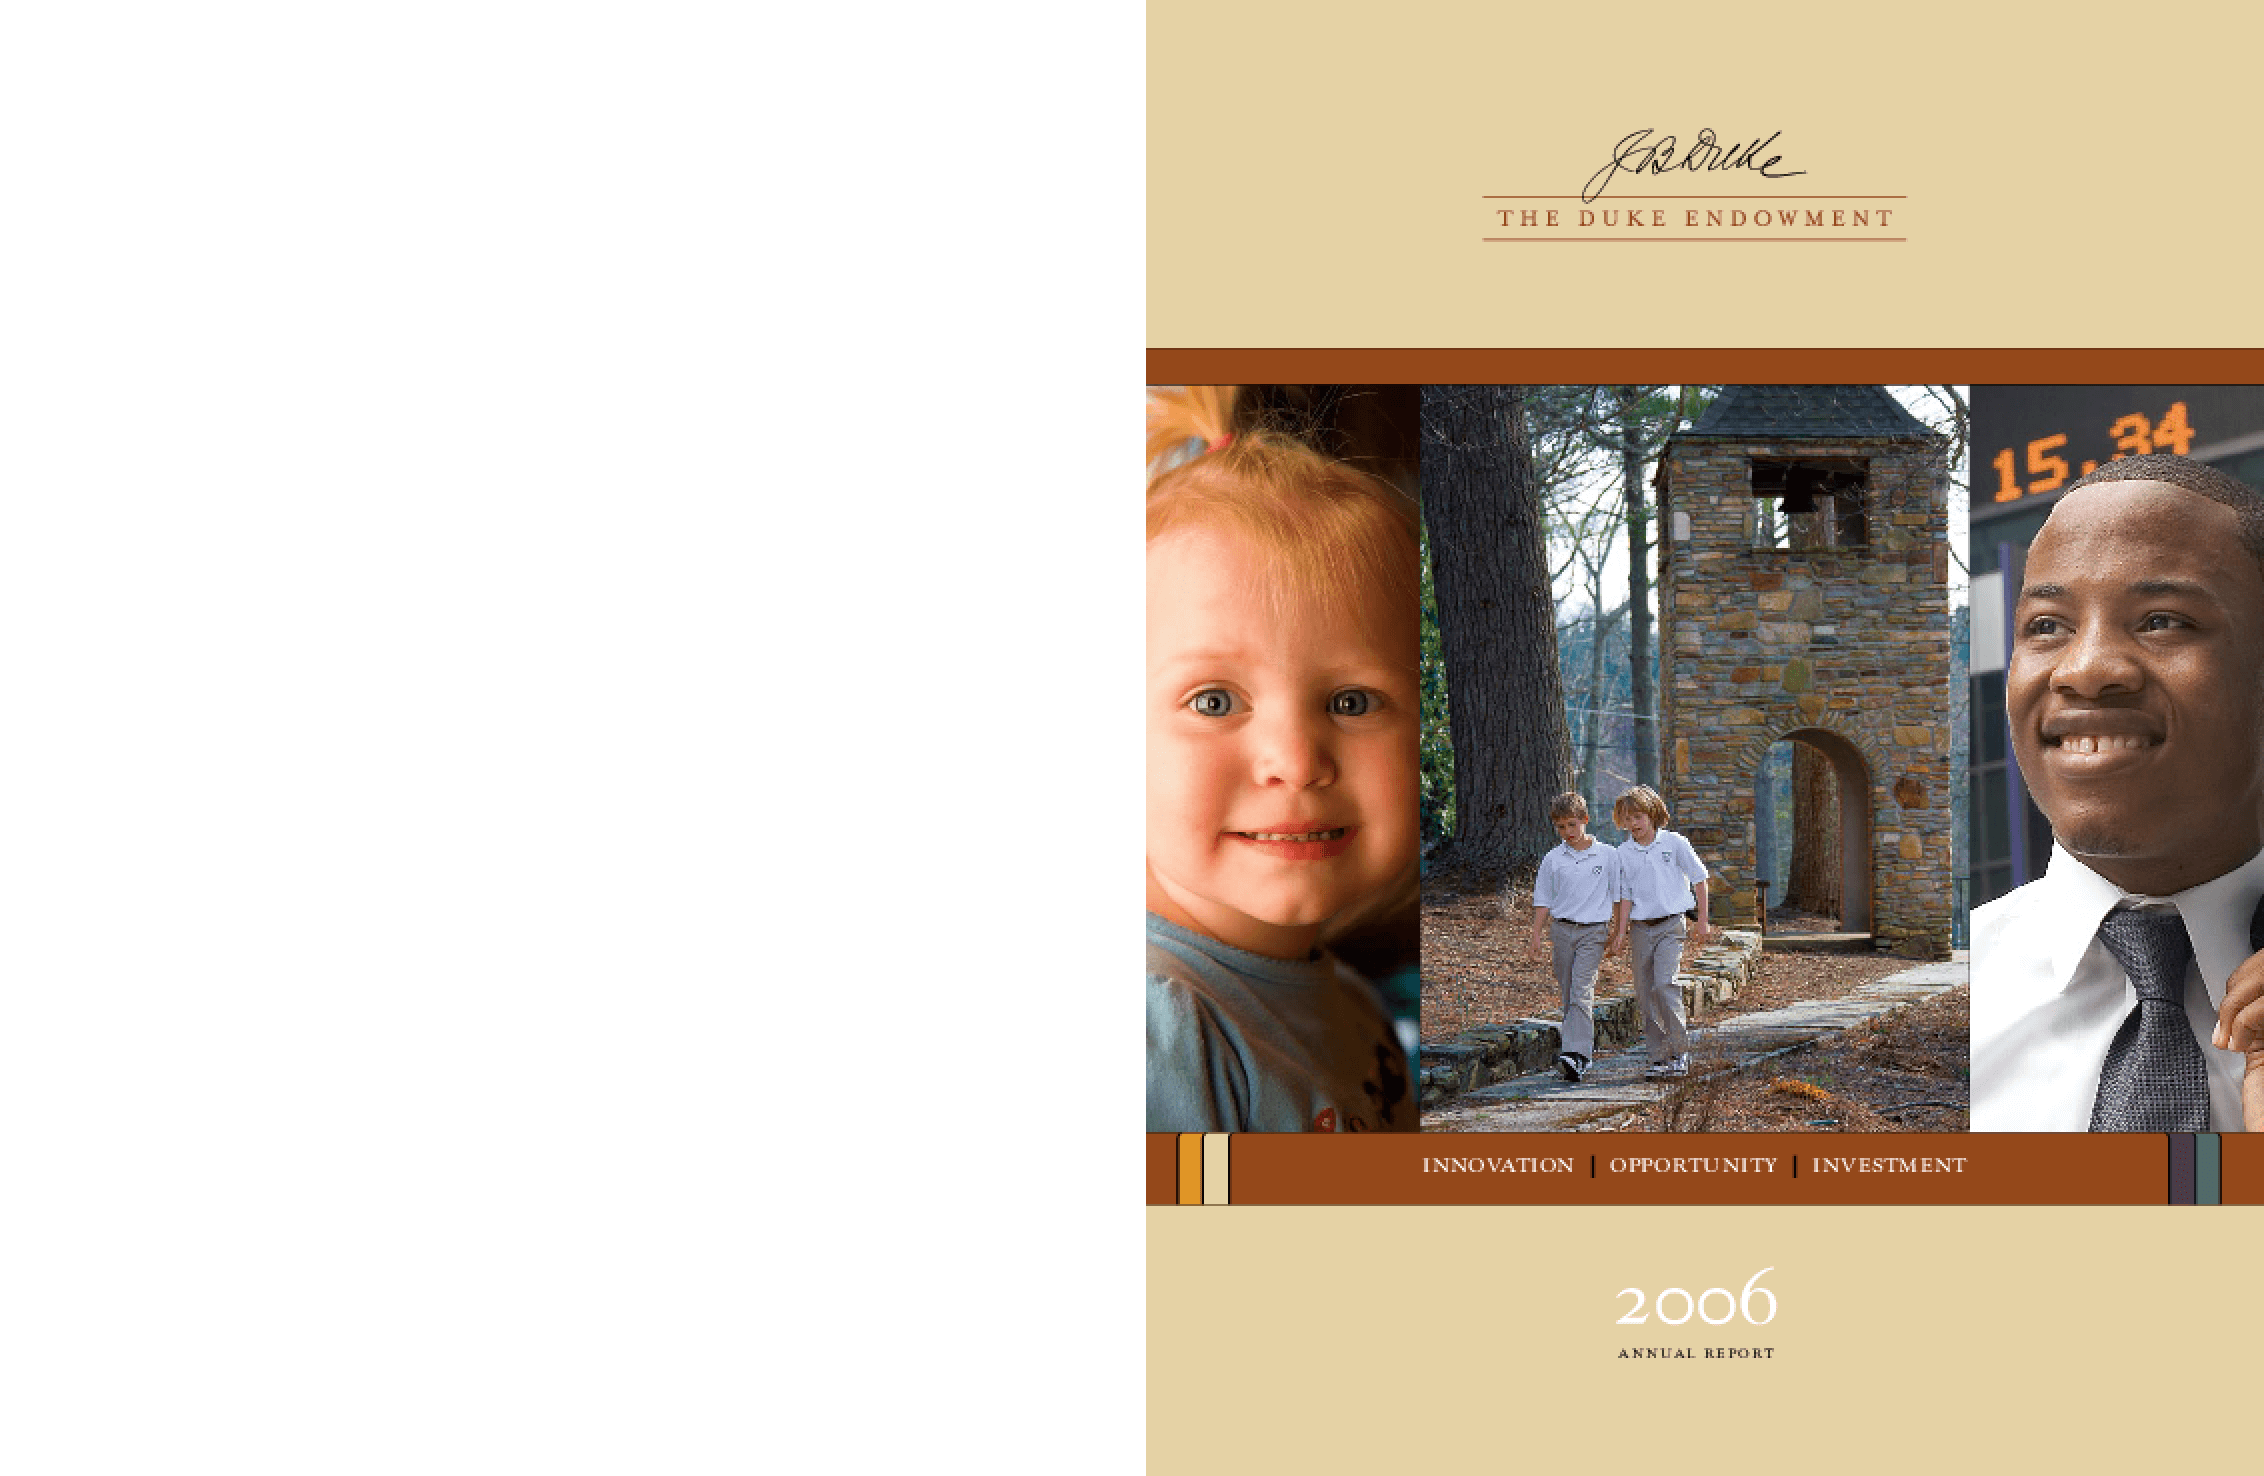 Duke Endowment - 2006 Annual Report